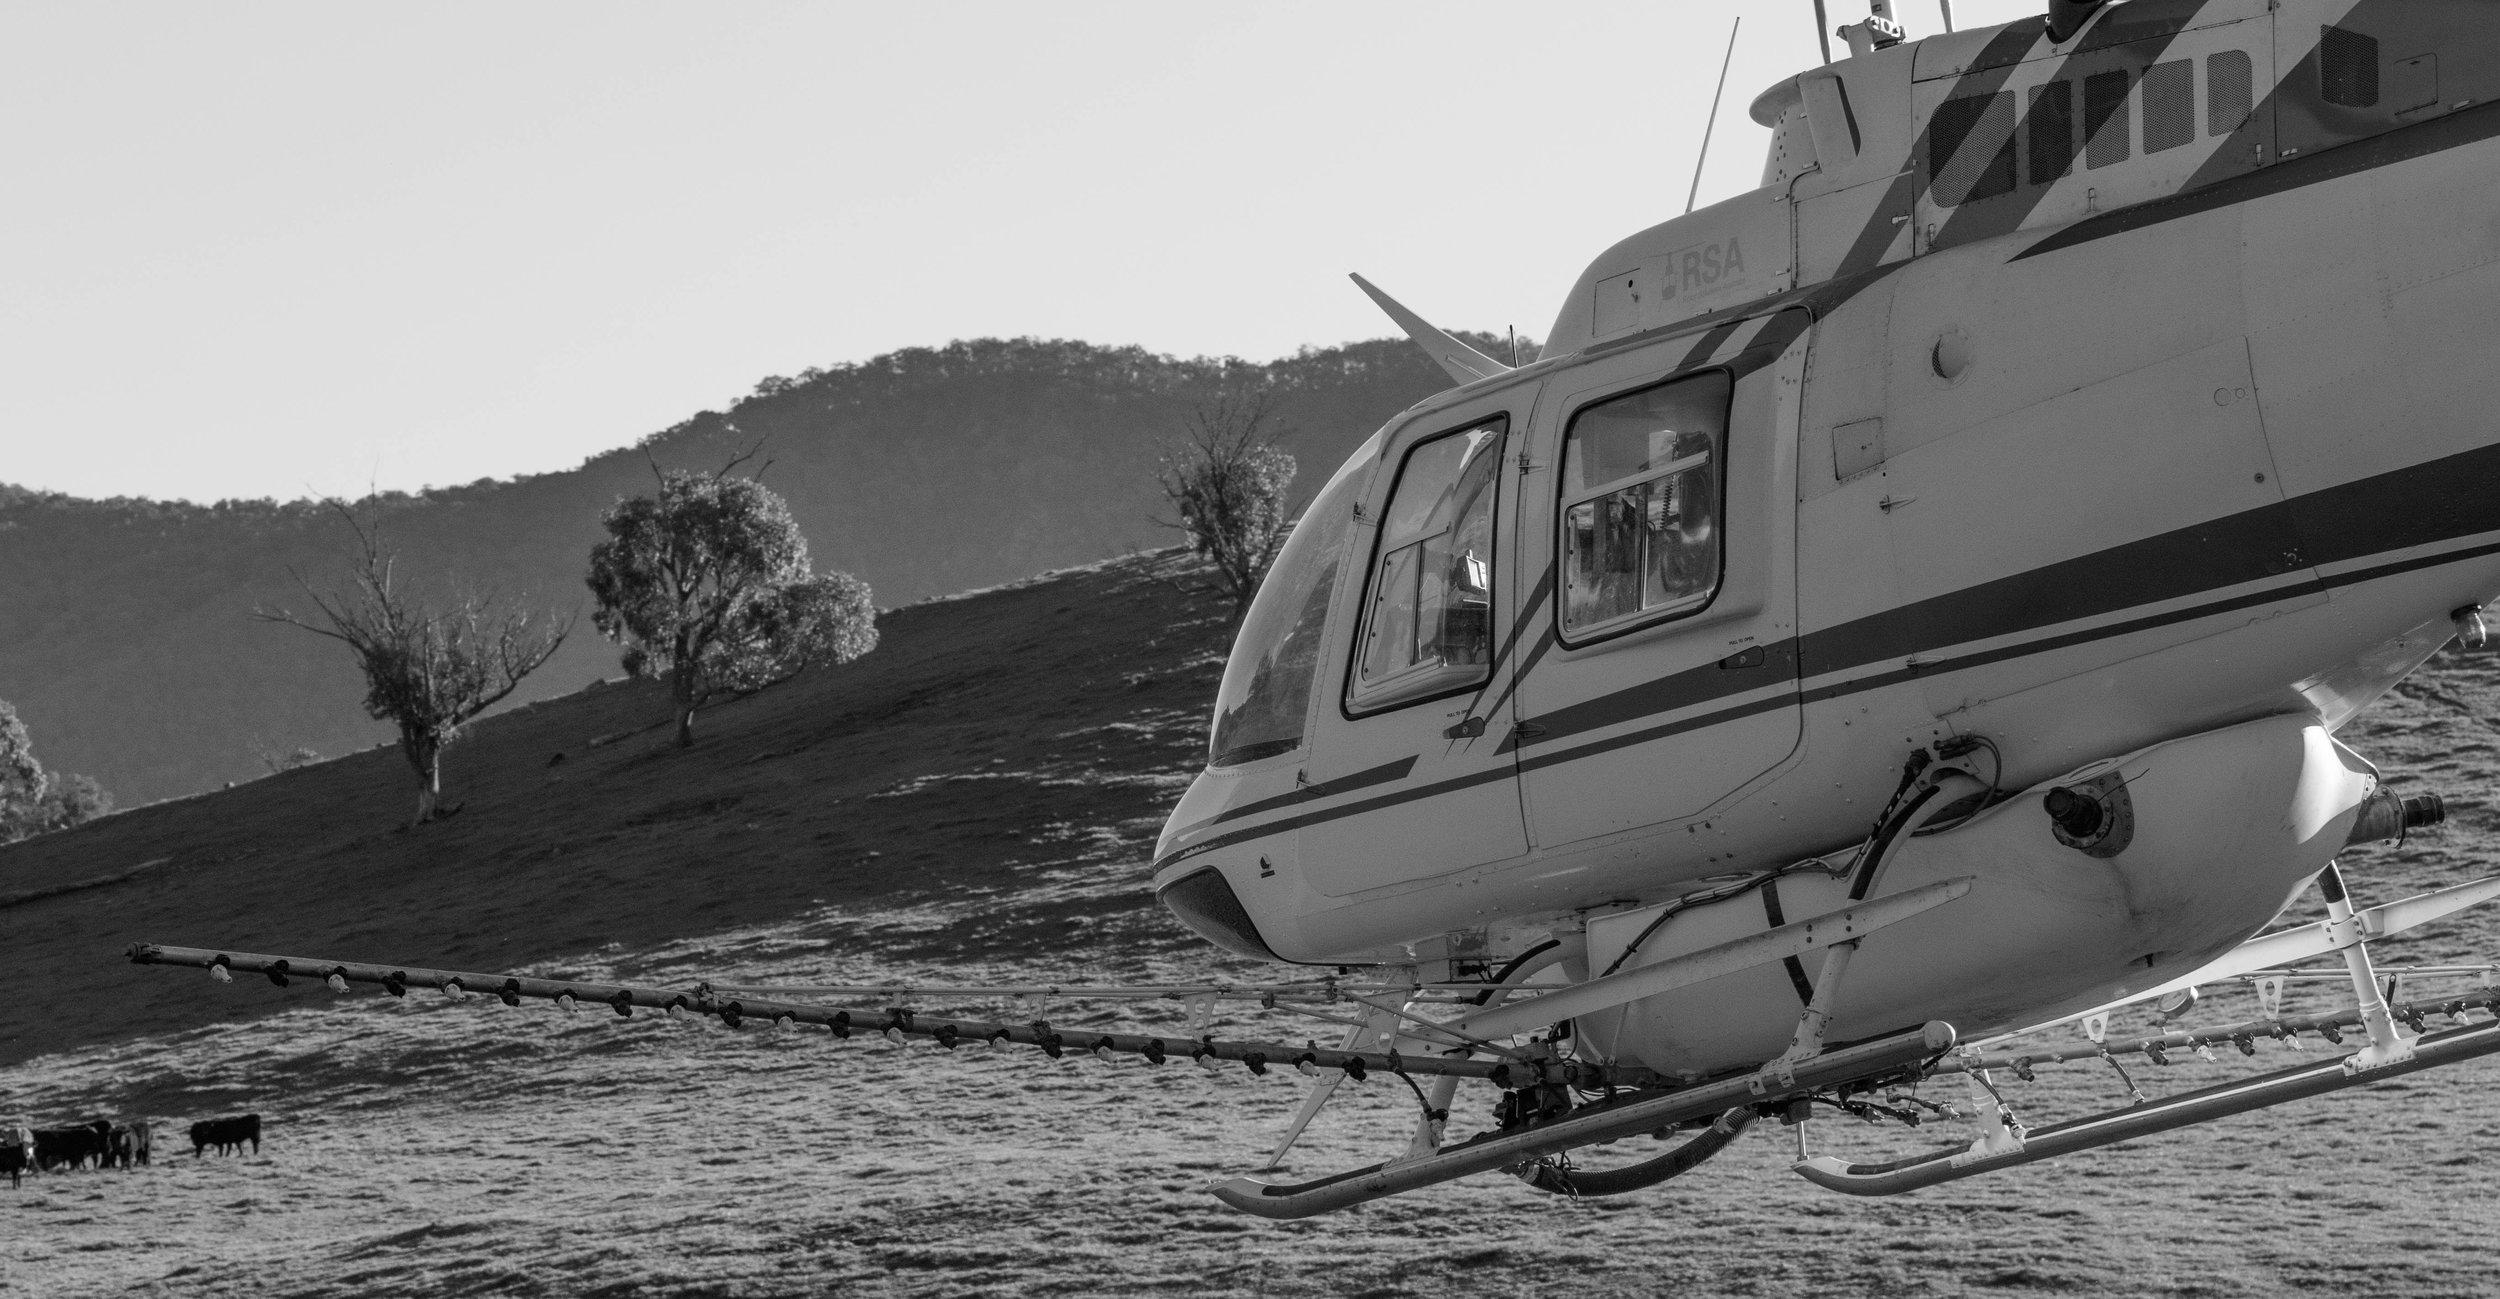 Jetranger Helicopter Spraying, Upper Murray NSW